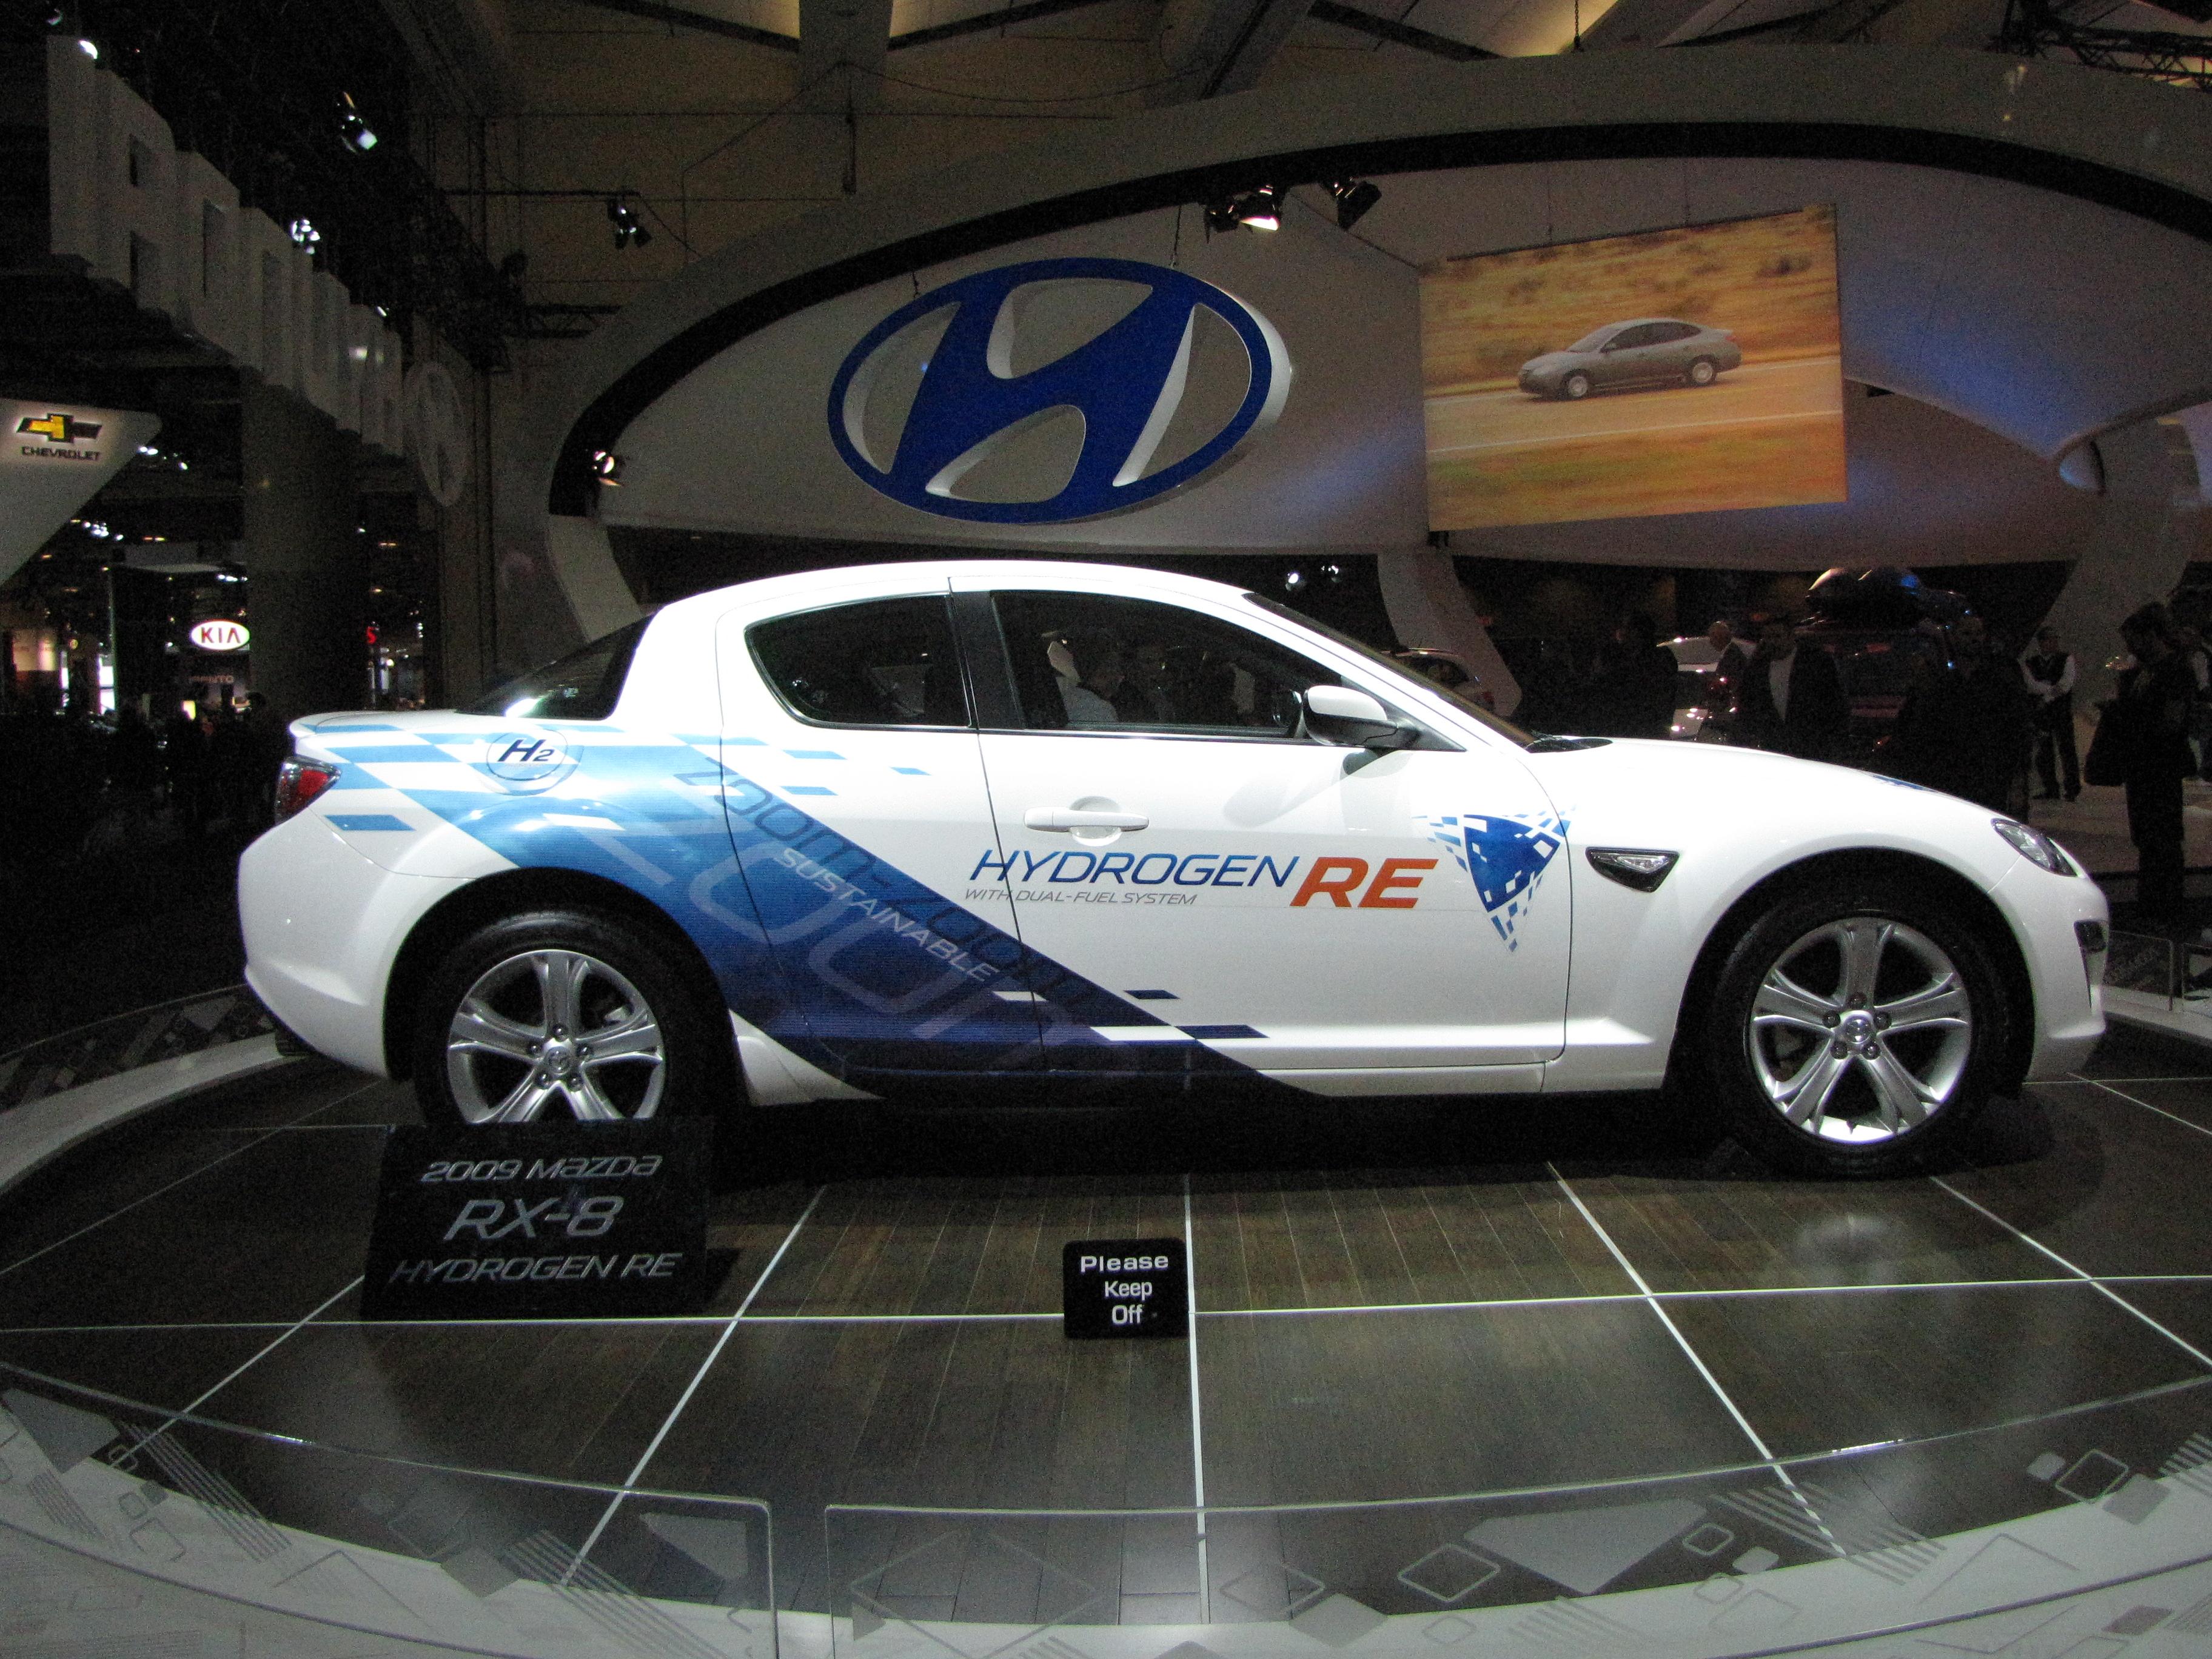 File:Mazda 2010 RX-8 Hydrogen RE Right.jpg - Wikimedia Commons